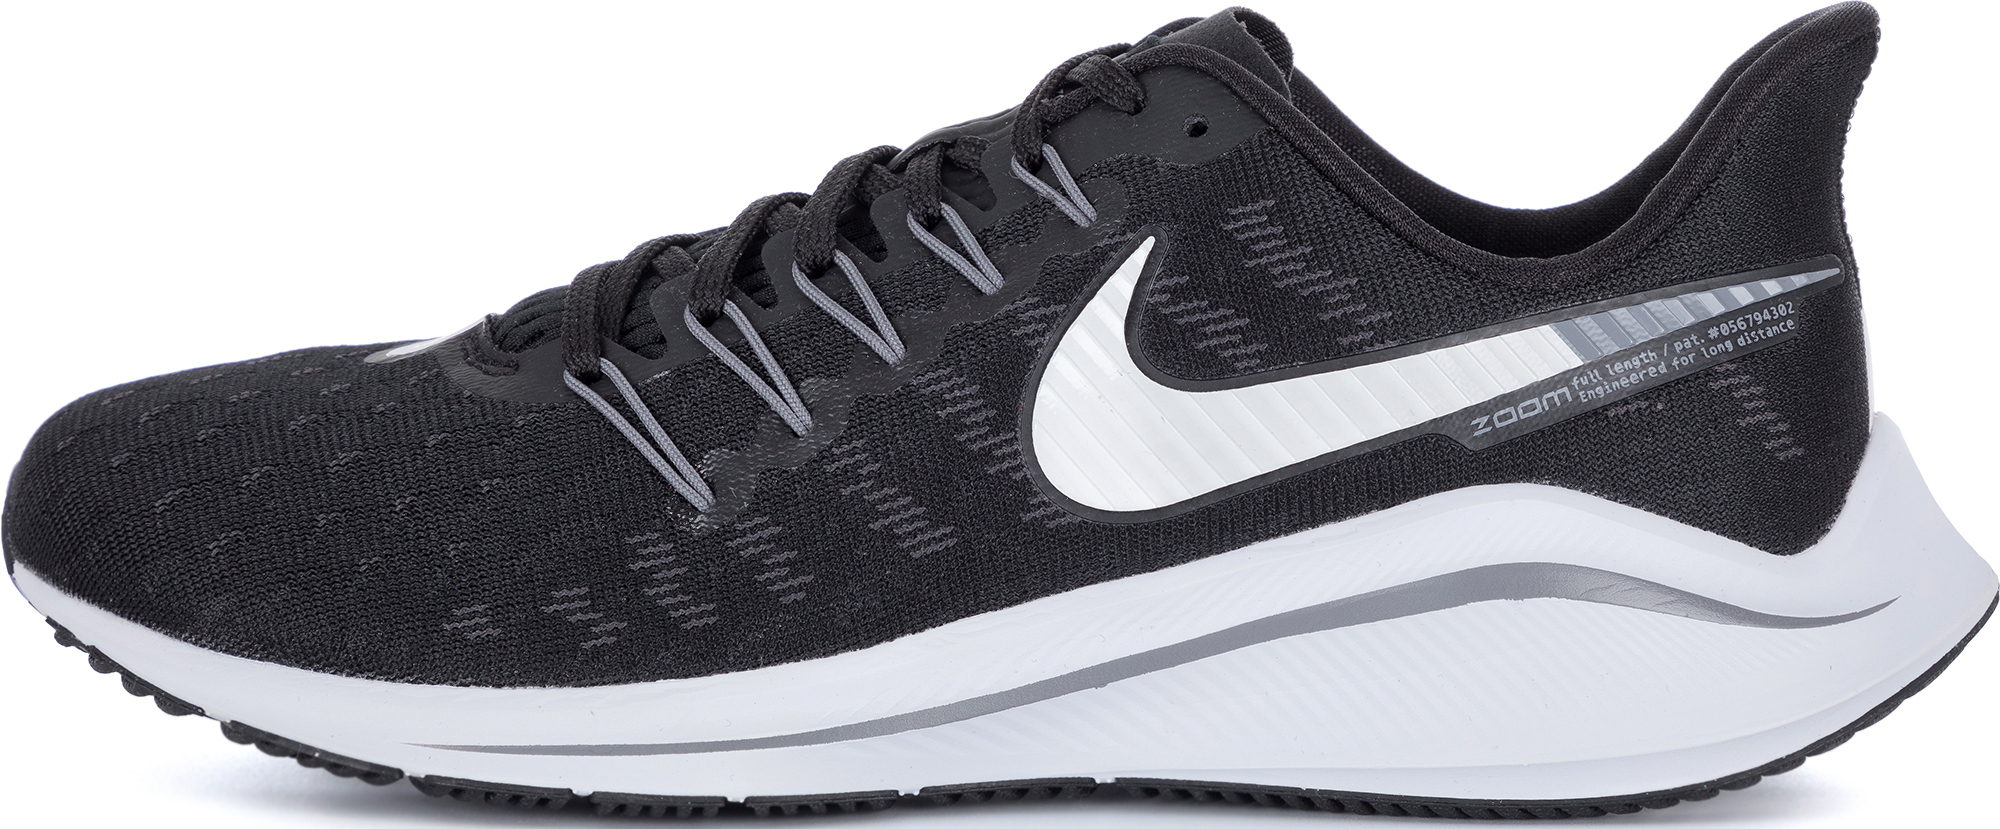 Nike Кроссовки женские Nike Air Zoom Vomero 14, размер 39,5